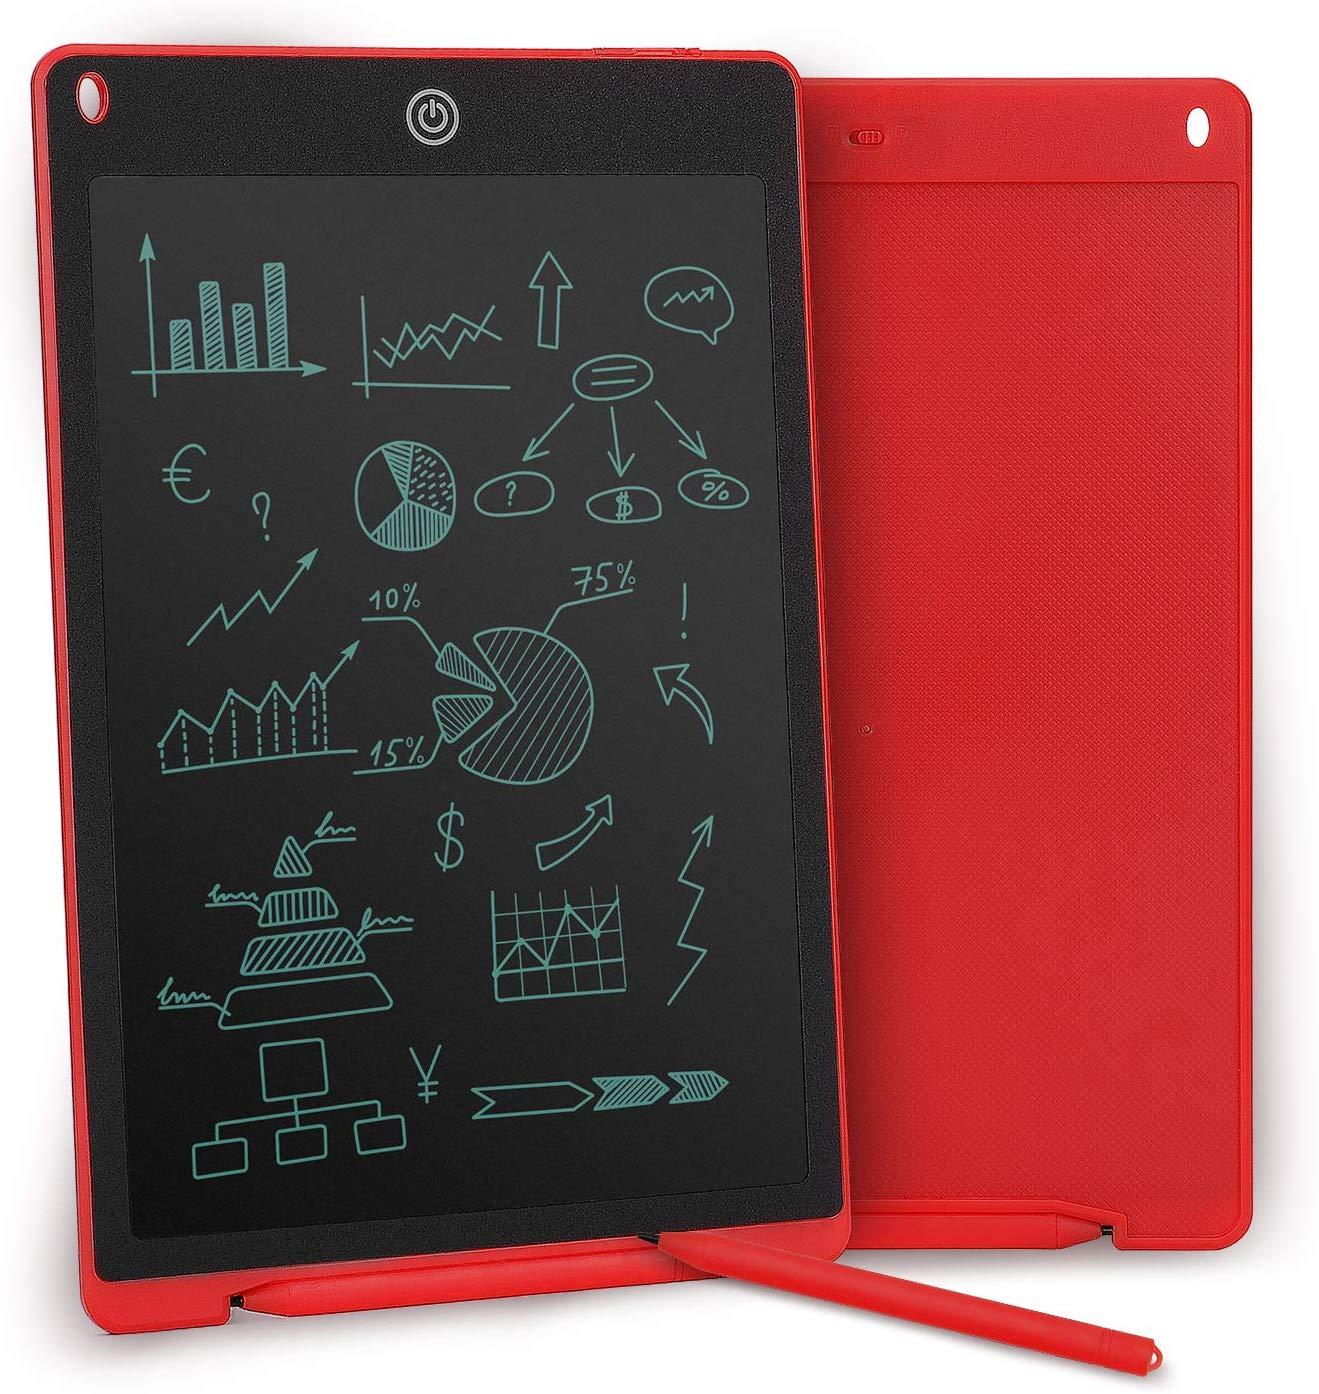 Tableta de escritura Mafiti ES-SXB01